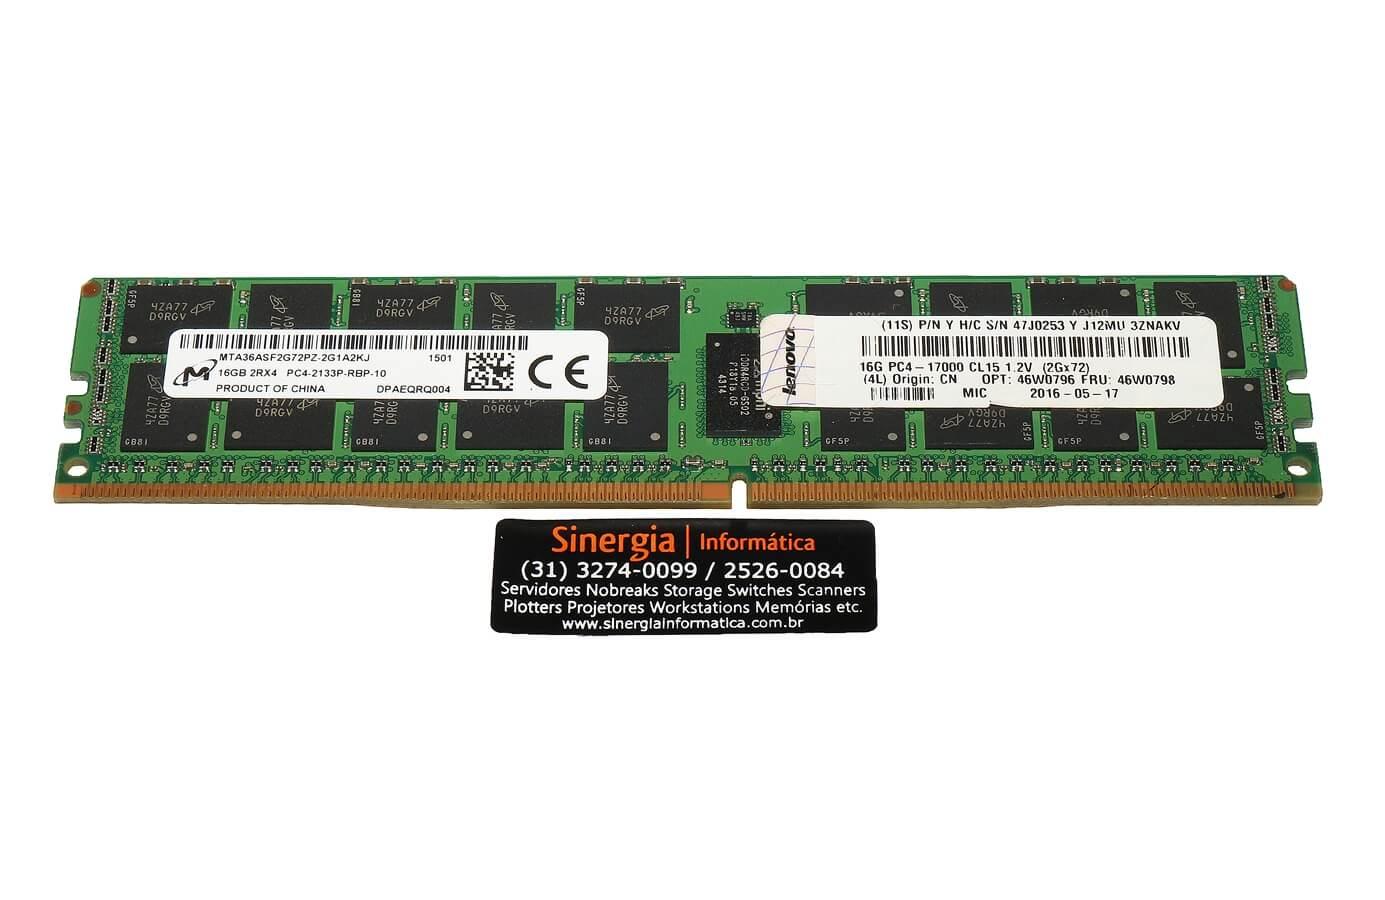 16G PC4-17000 CL15 1.2V (2GX72) Memória Lenovo 16GB DDR4 2133MHz ECC Registrada Servidor Lenovo System X3550 x3650 M5 x3850 x3950 X6 pronta entrega